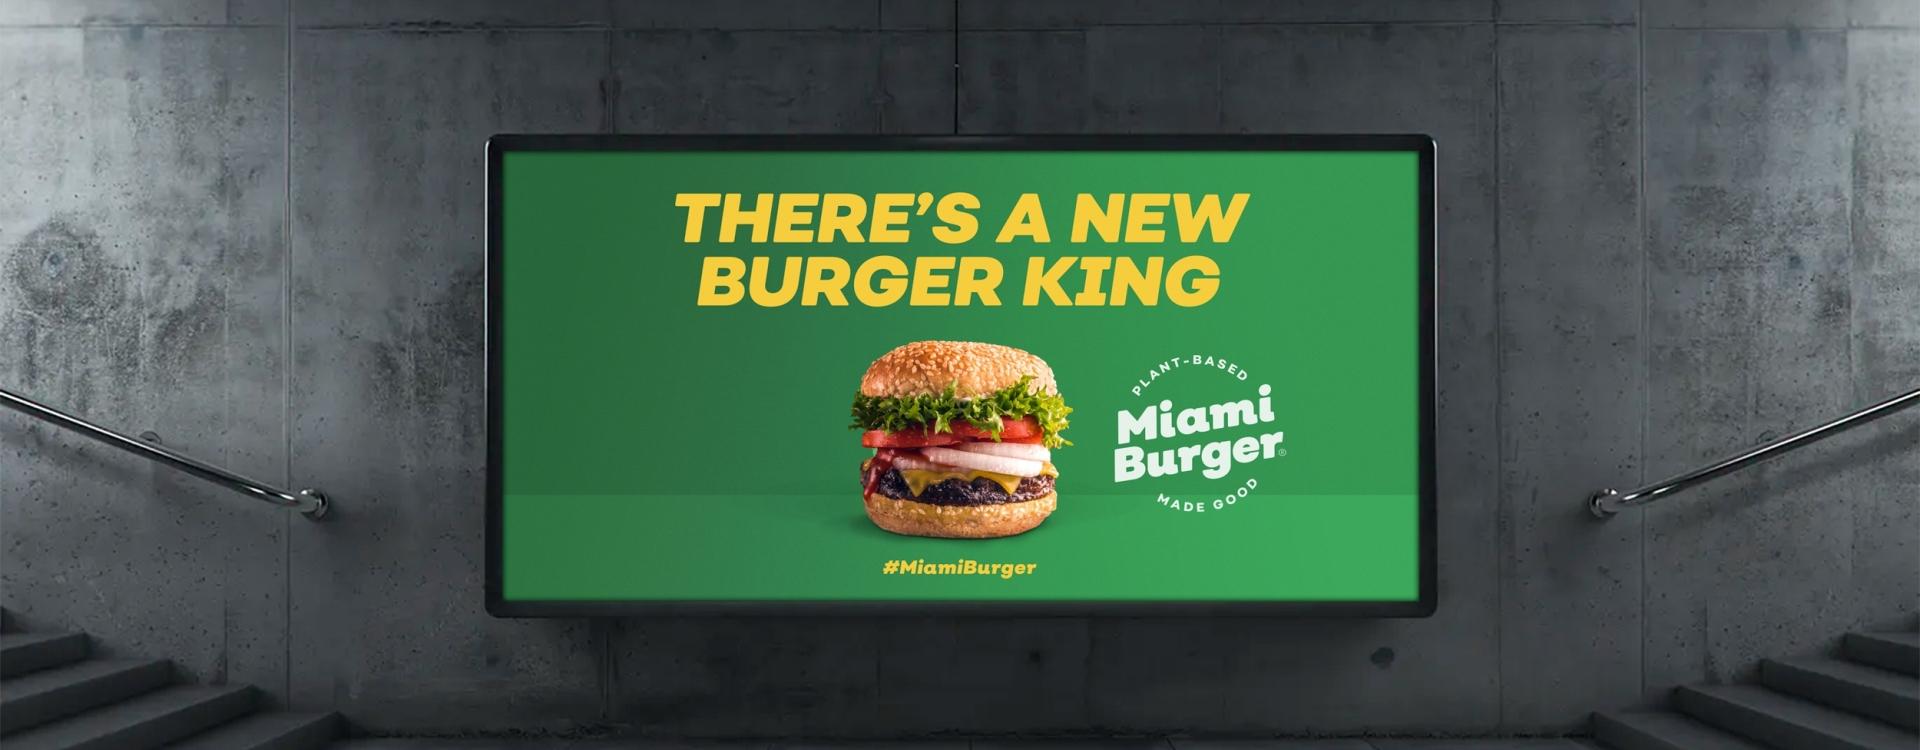 Work miami burger billboard grn